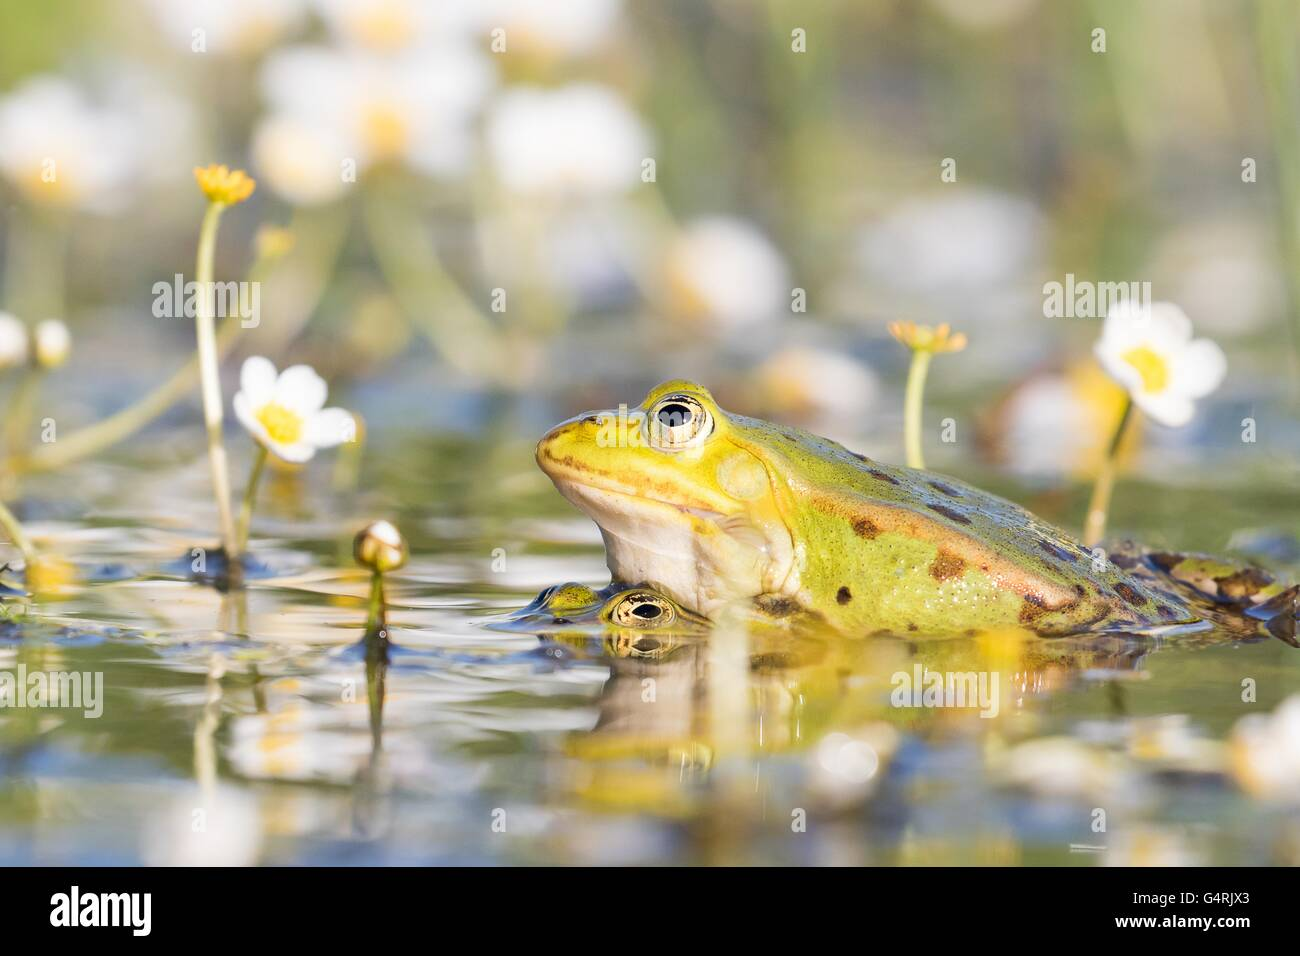 Ranas comestibles (Pelophylax esculentus) en agua, el apareamiento, agua blanca (Ranunculus aquatilis crowfoot), Imagen De Stock